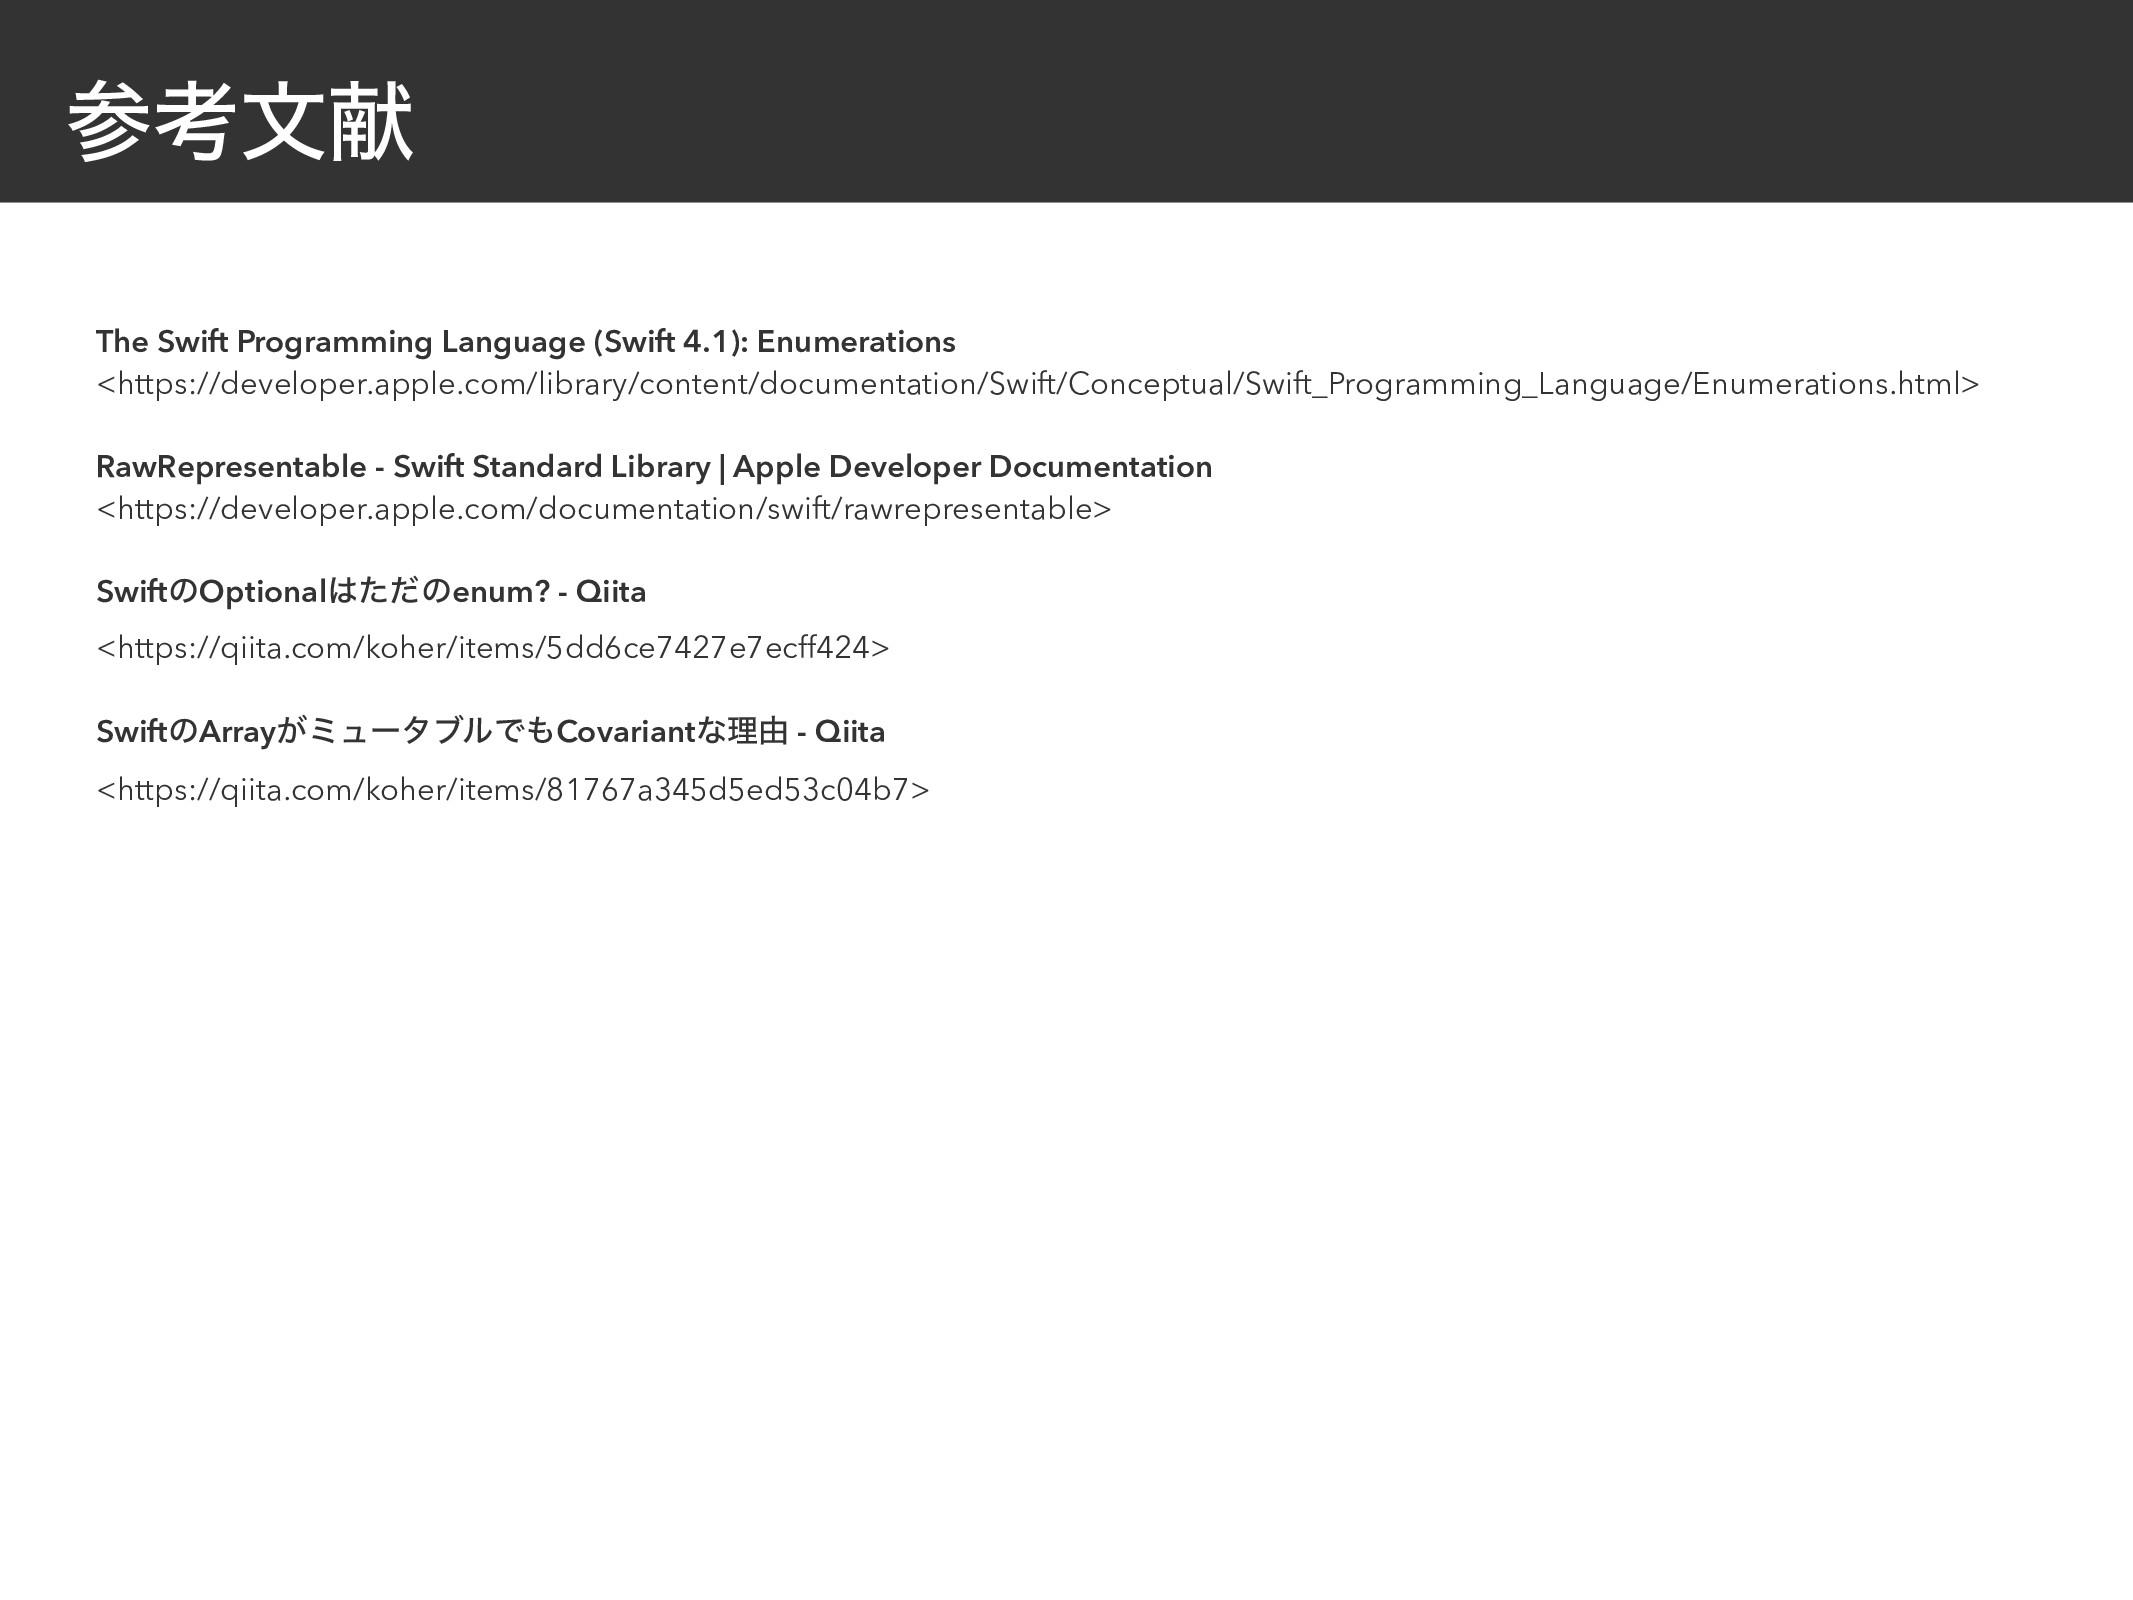 ߟจݙ The Swift Programming Language (Swift 4.1)...